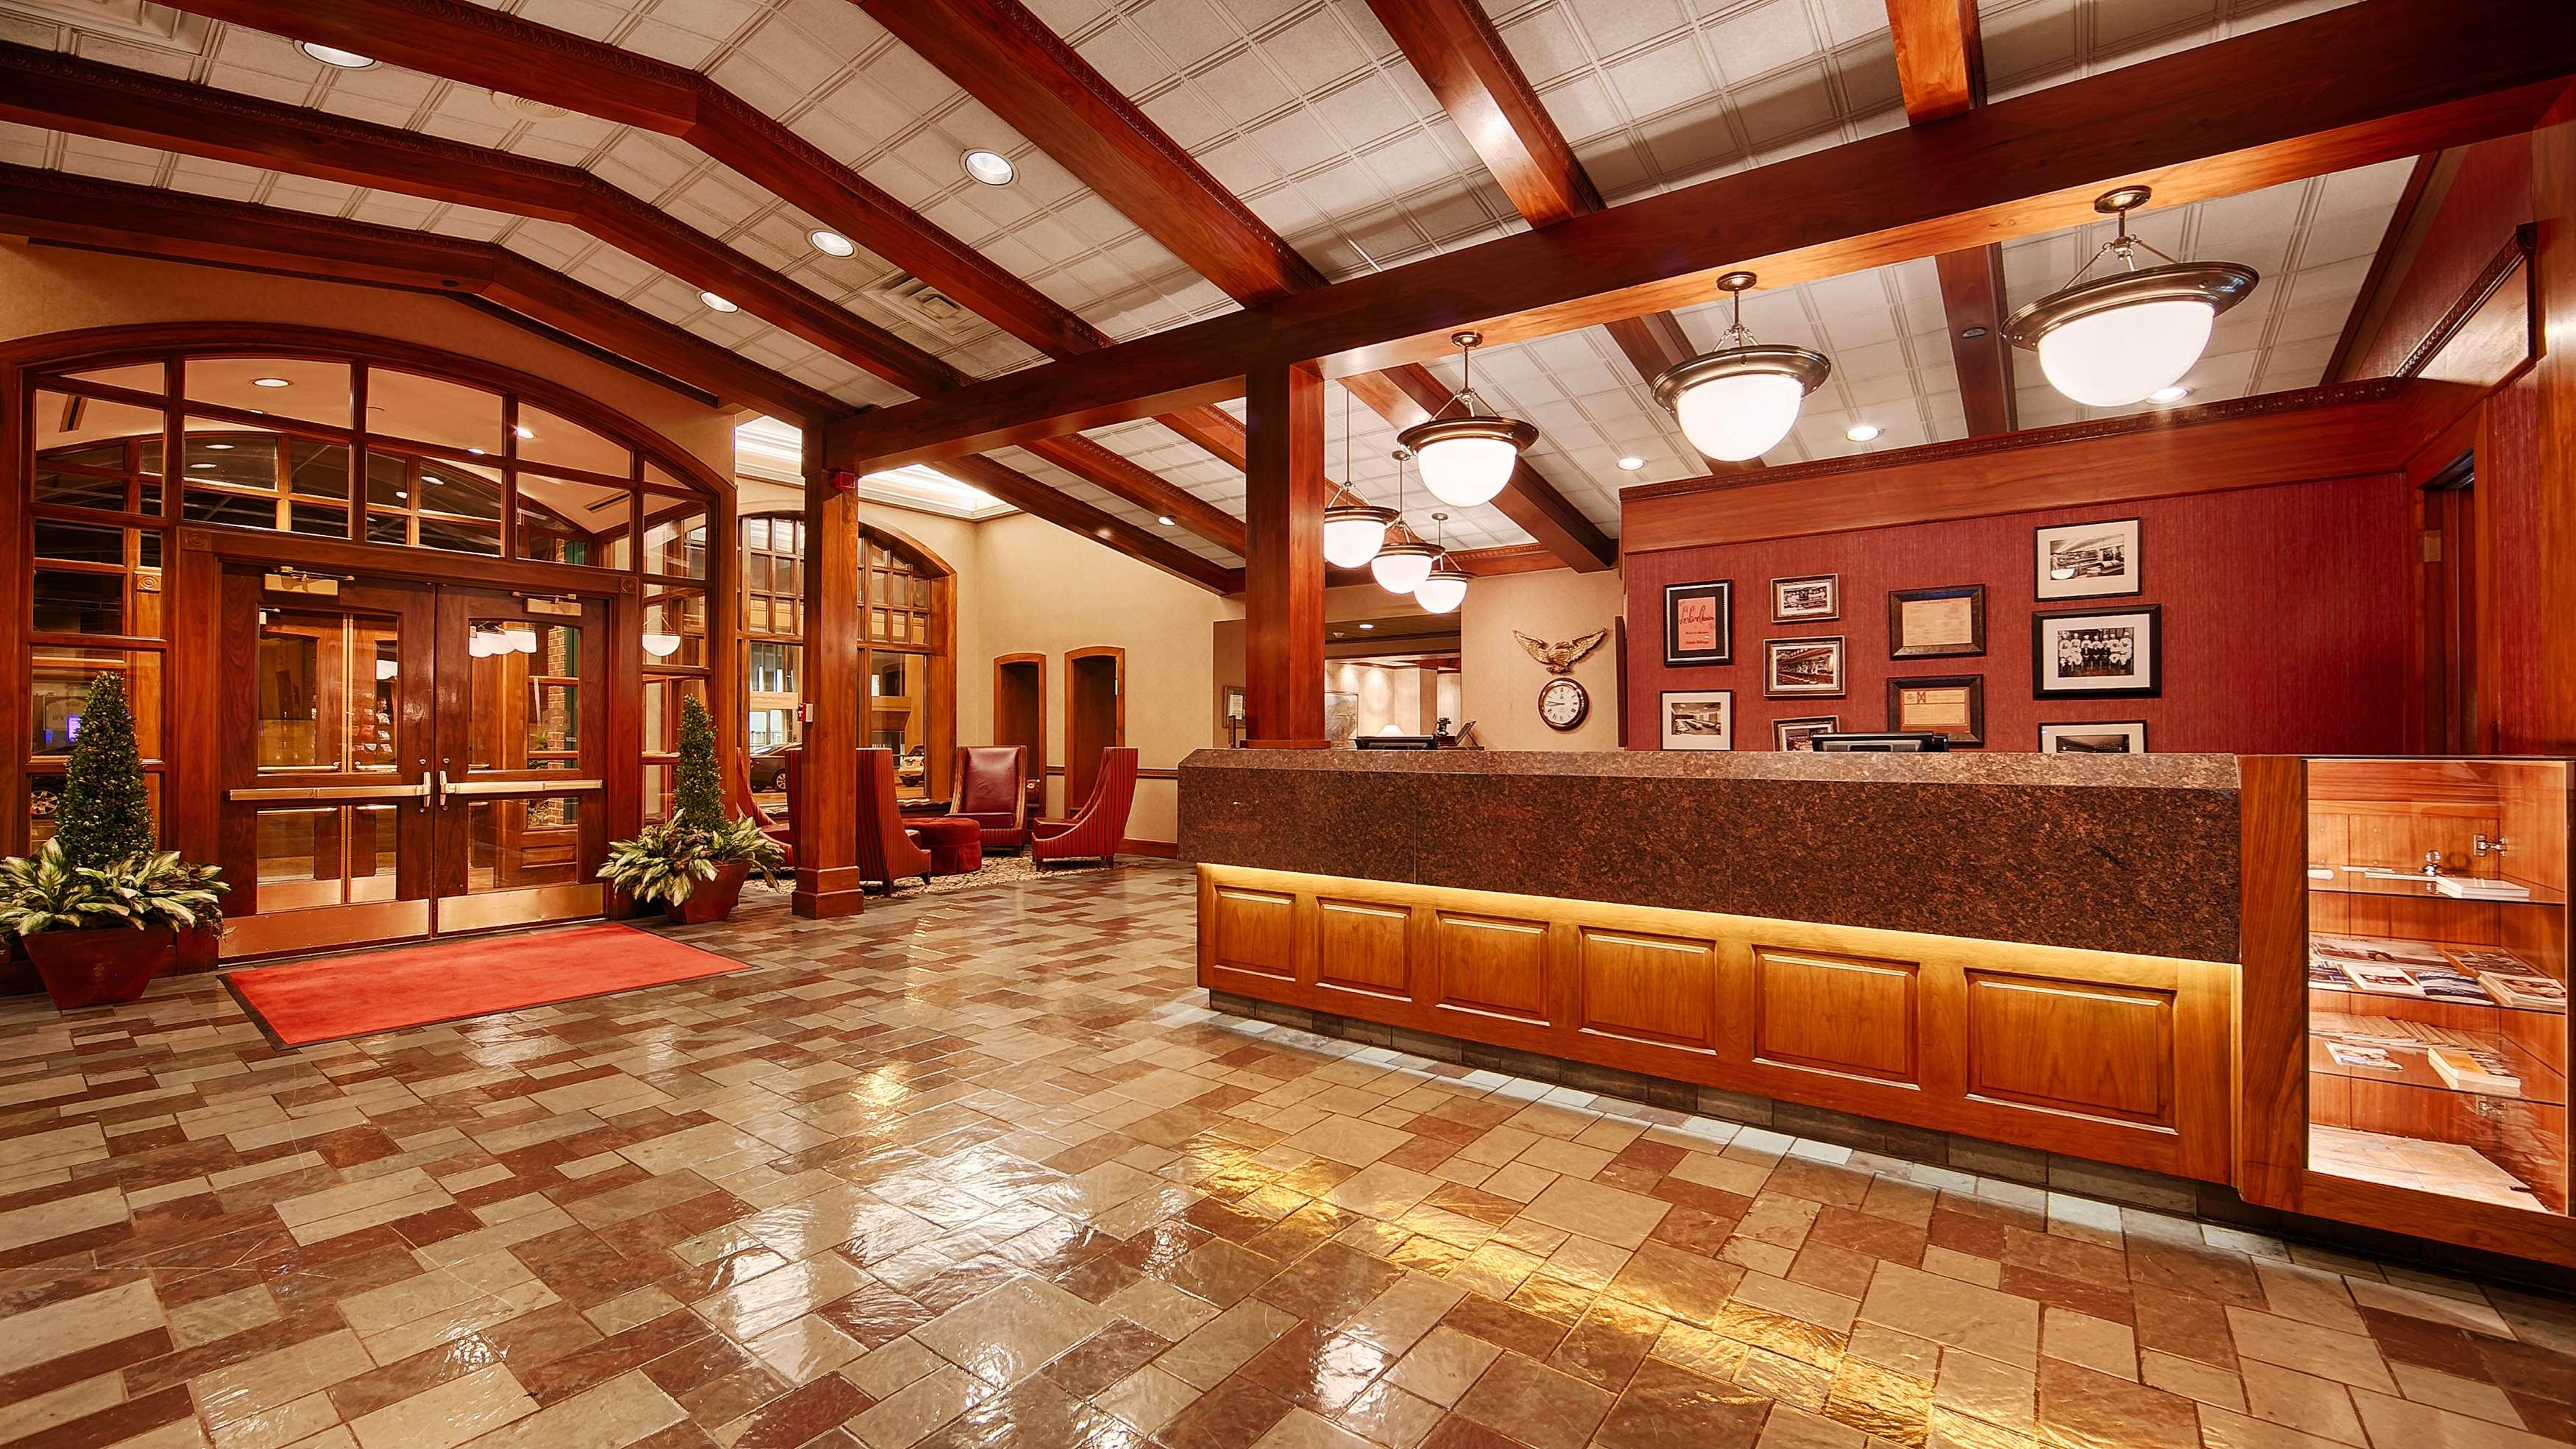 Best Western Plus The Normandy Inn & Suites image 4